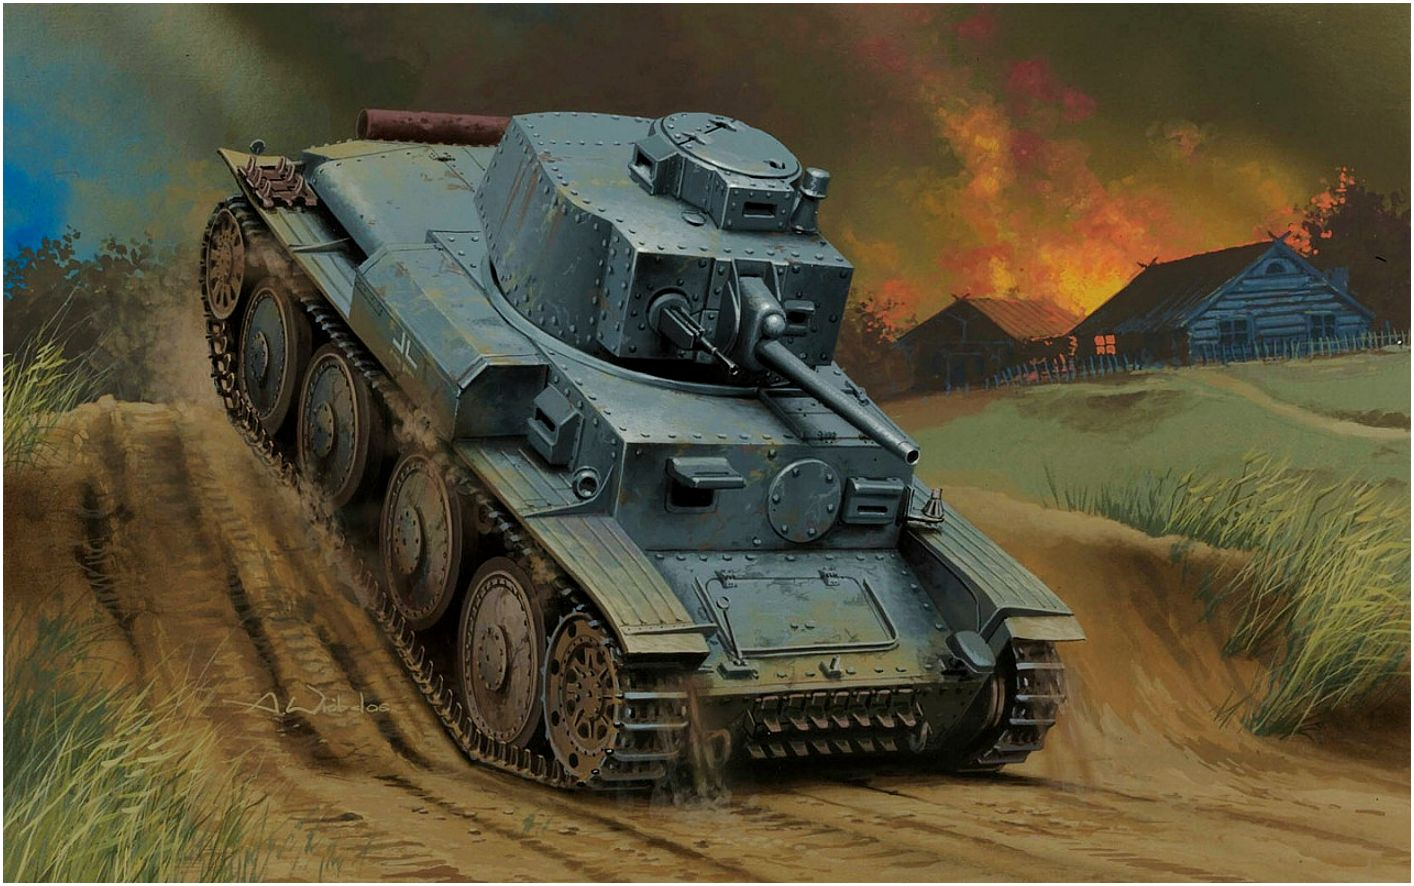 Wróbel Arkadiusz. Танк Pz.Kpfw. 38(t) Ausf. G.